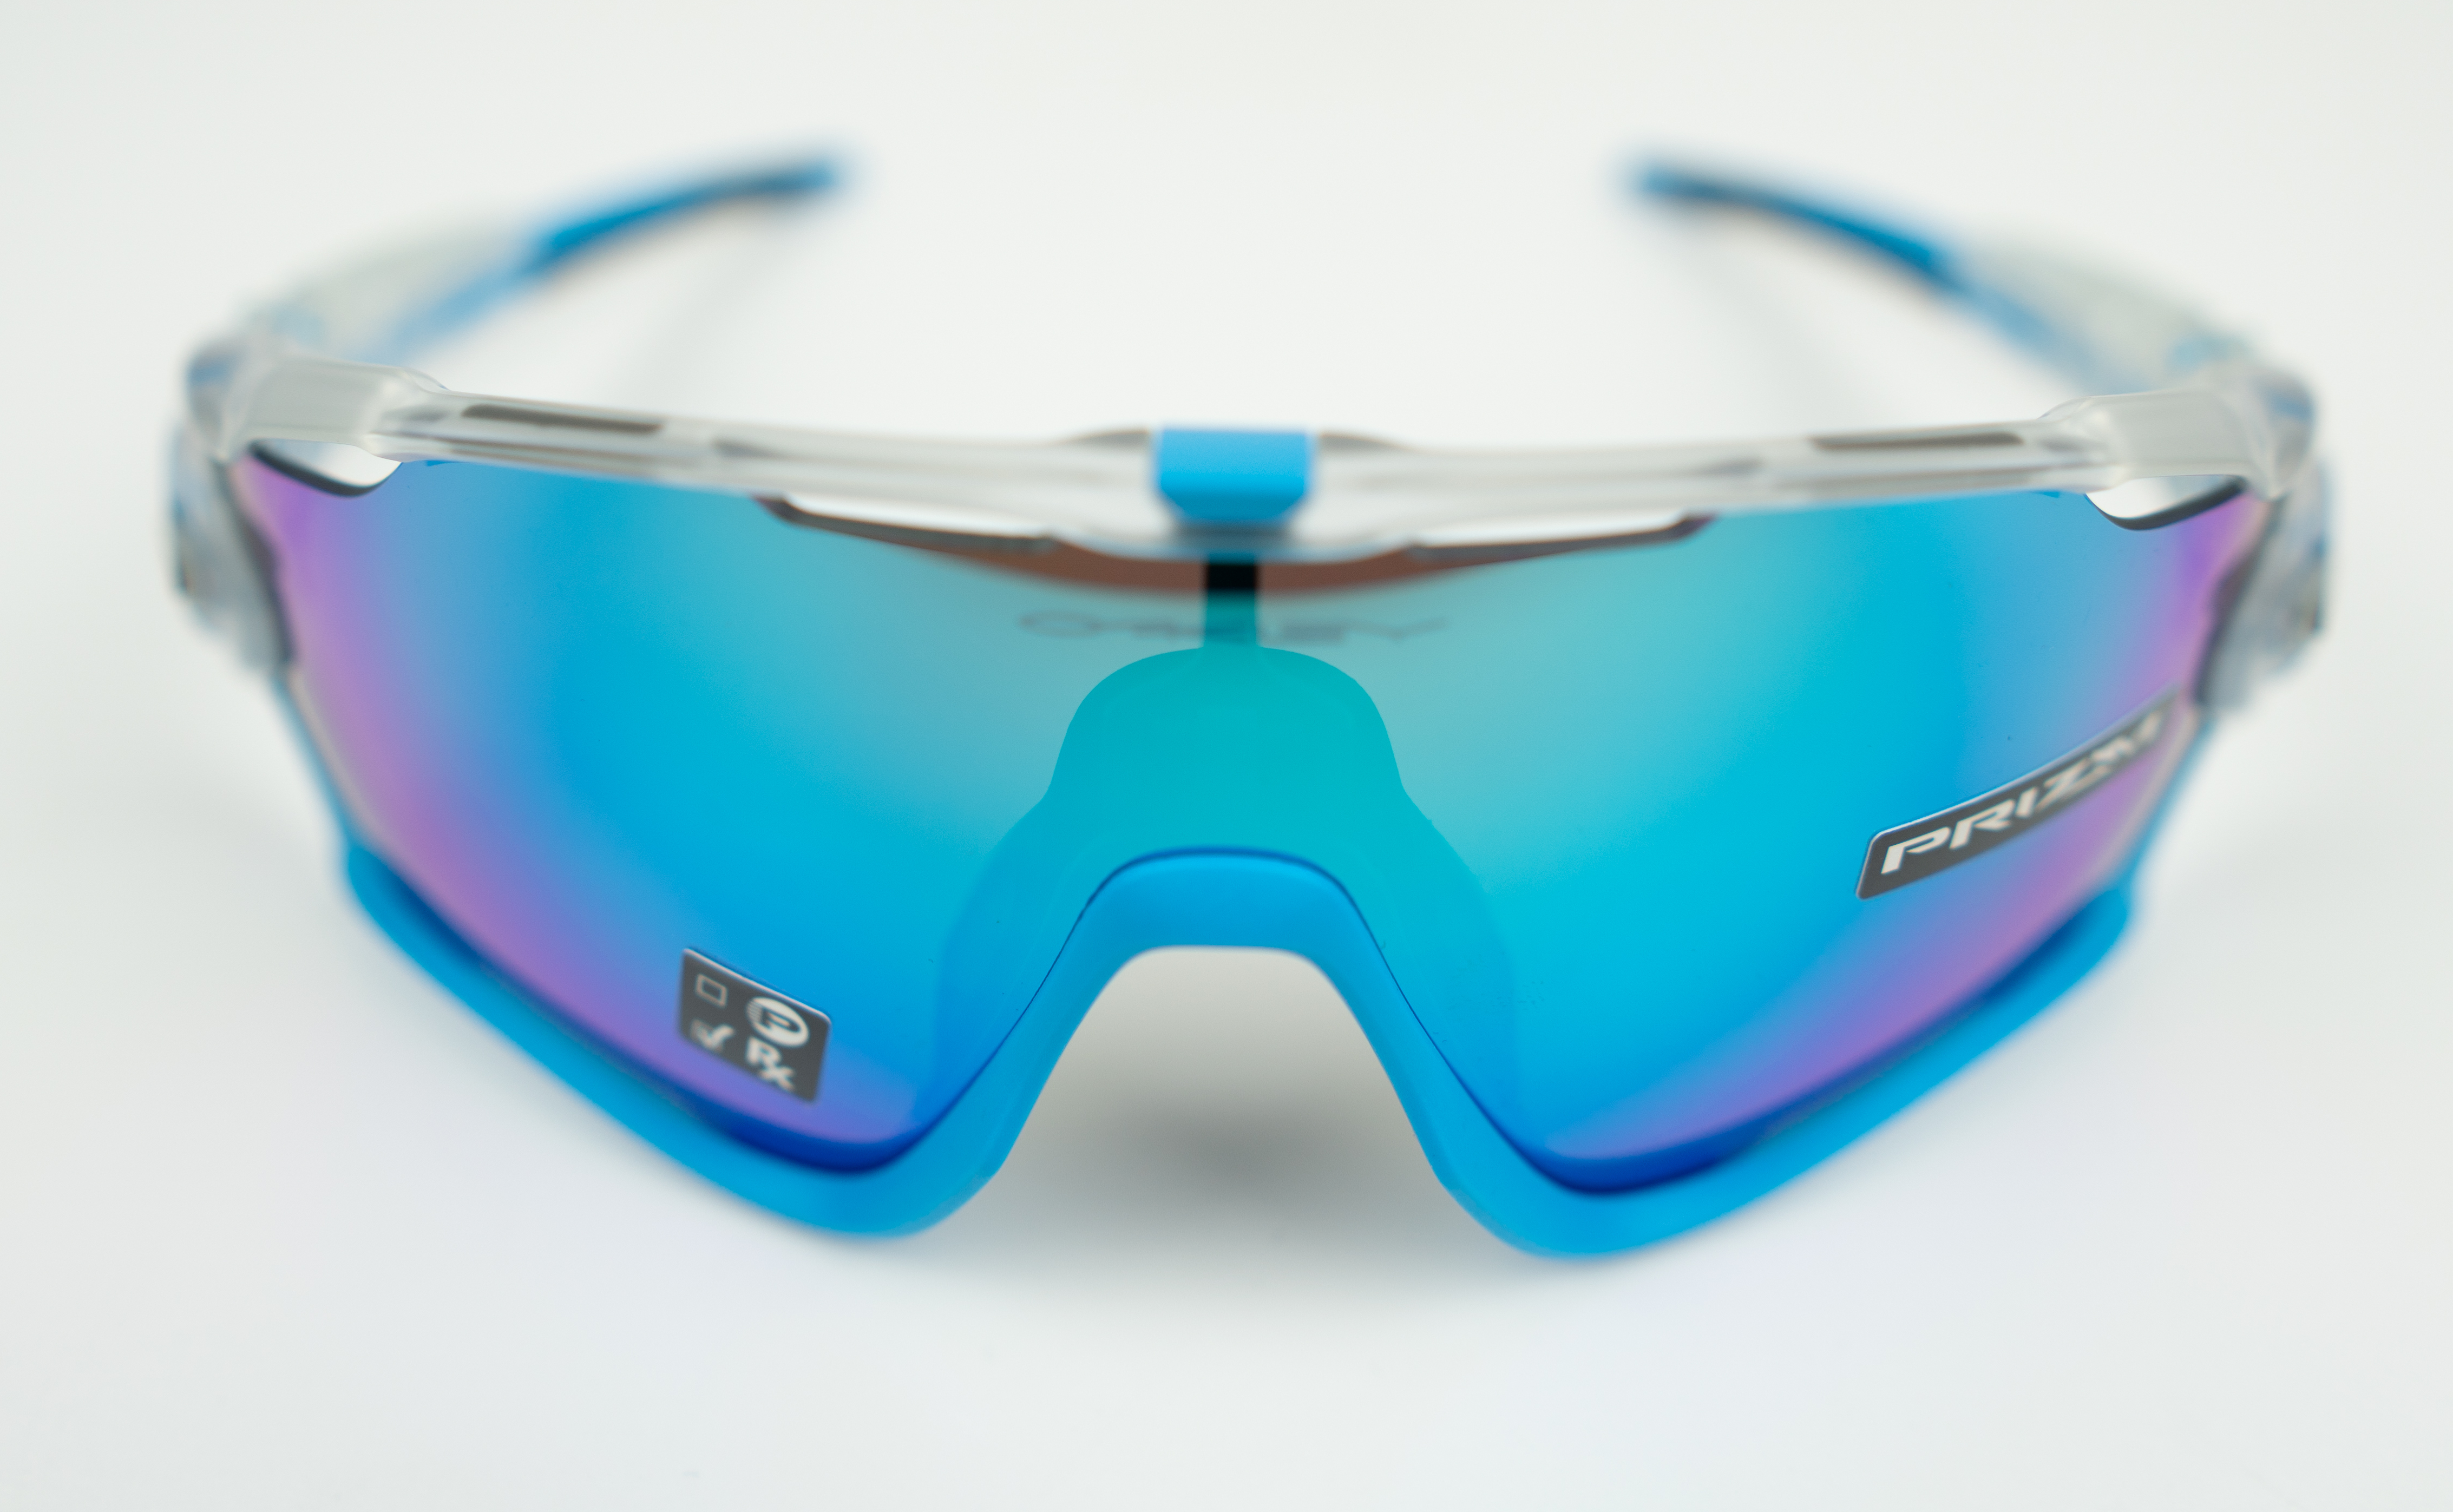 da7a556809 Oakley Jawbreaker Sunglasses Crystal Pop Sapphire Prizm £157.50